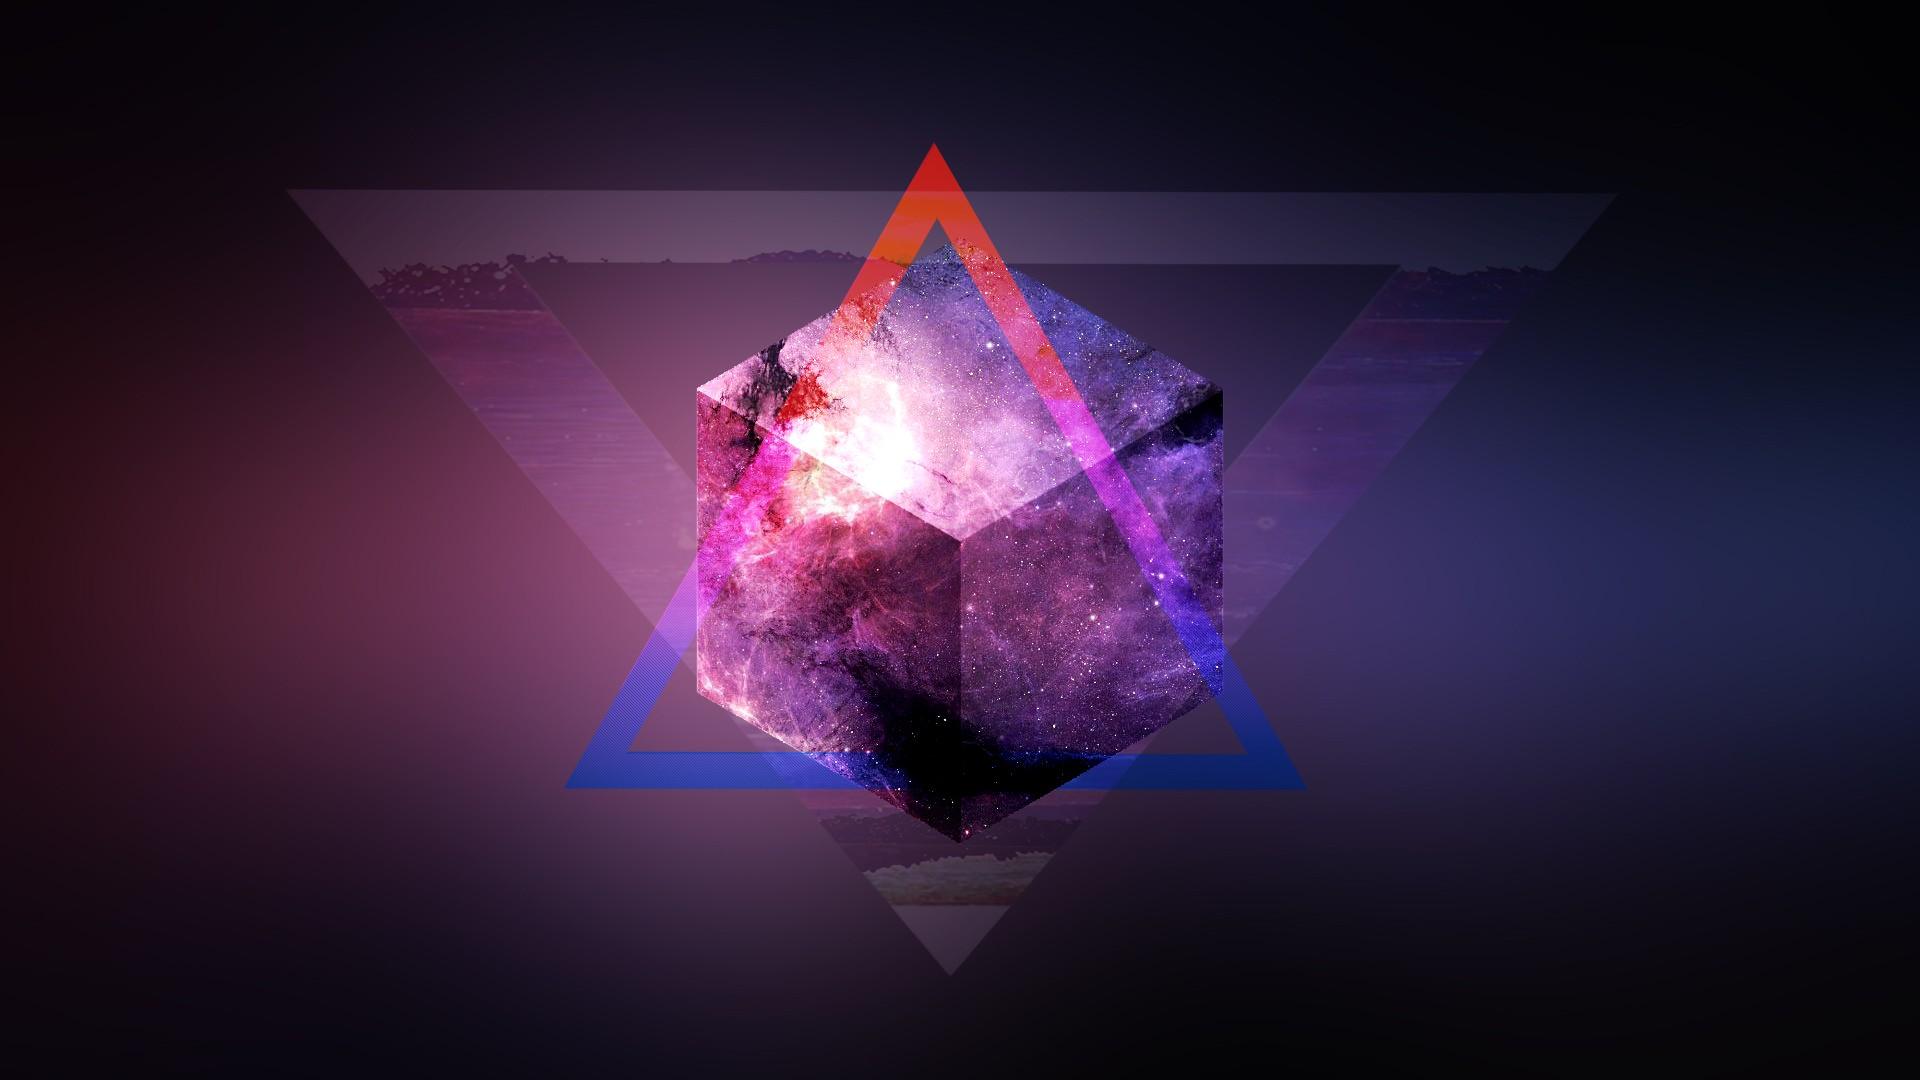 Wallpaper 3d Space Purple Sphere Triangle Blurred